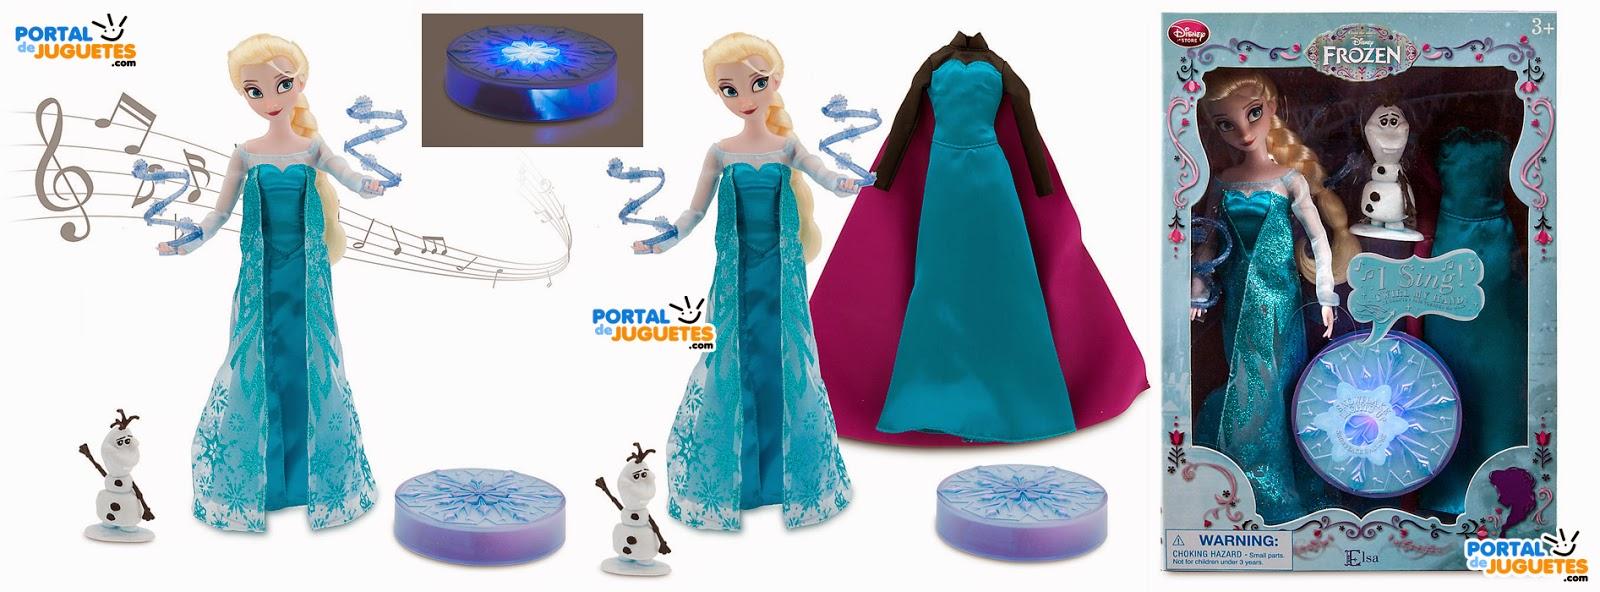 muñeca elsa cantarina edicion deluxe frozen disney store